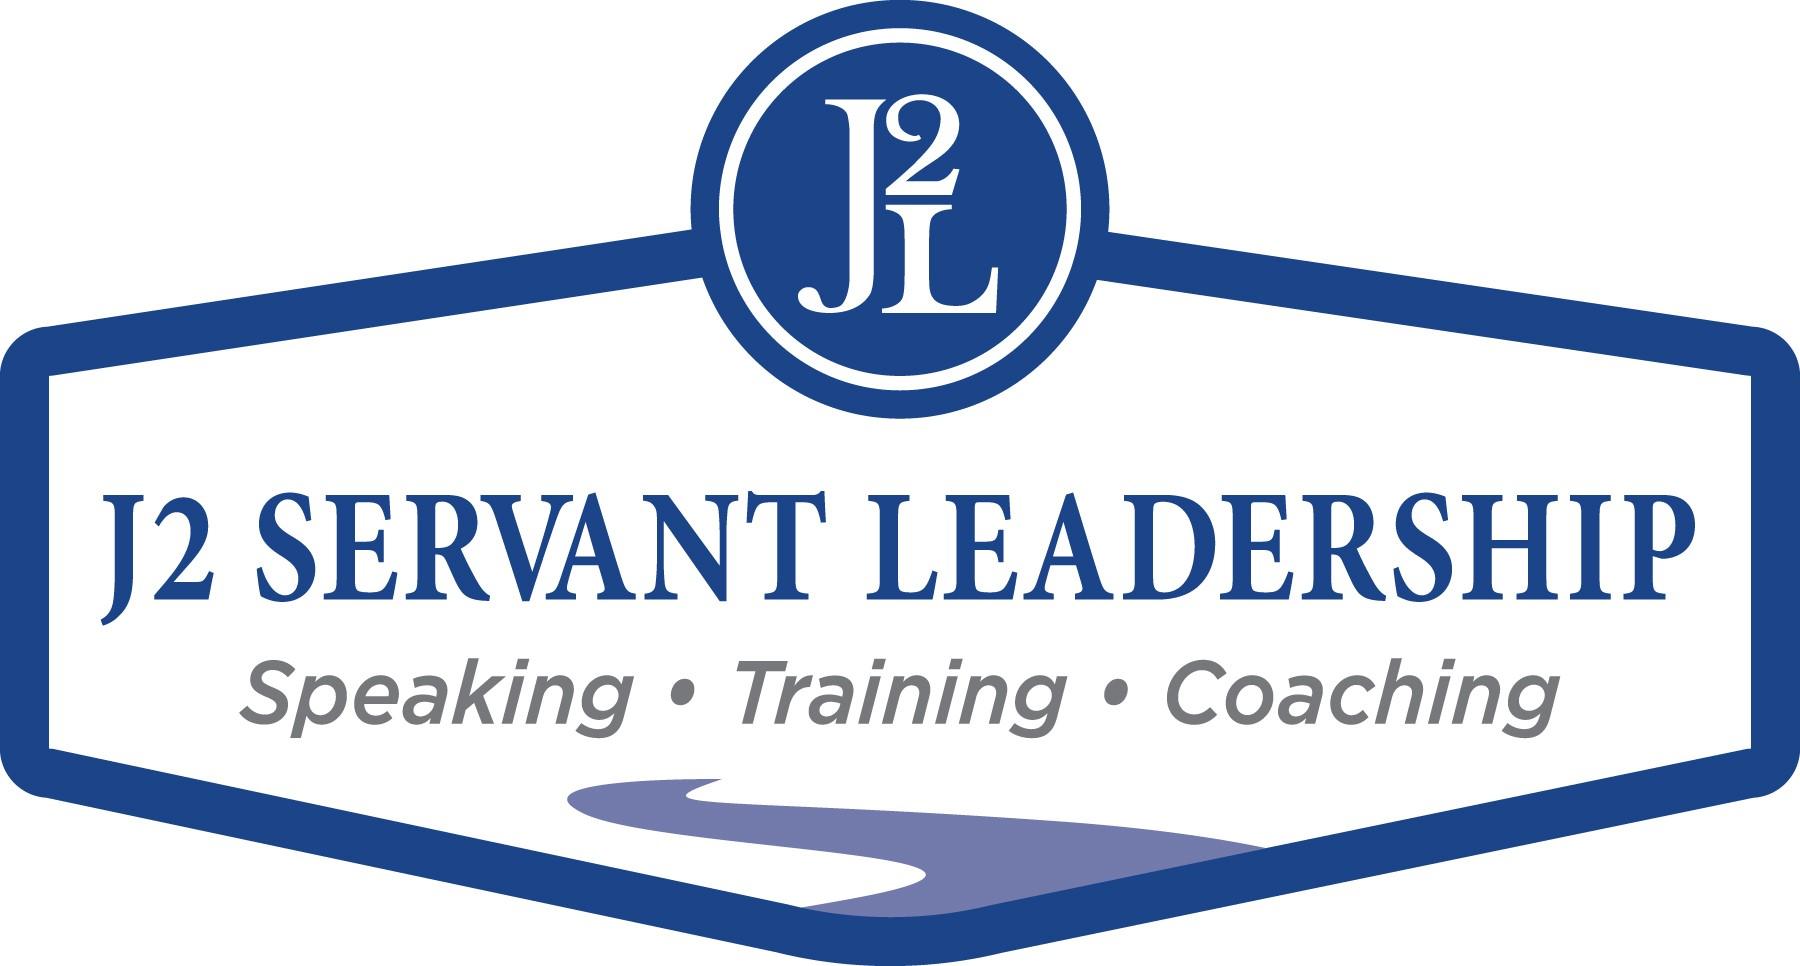 J2 Servant Leadership